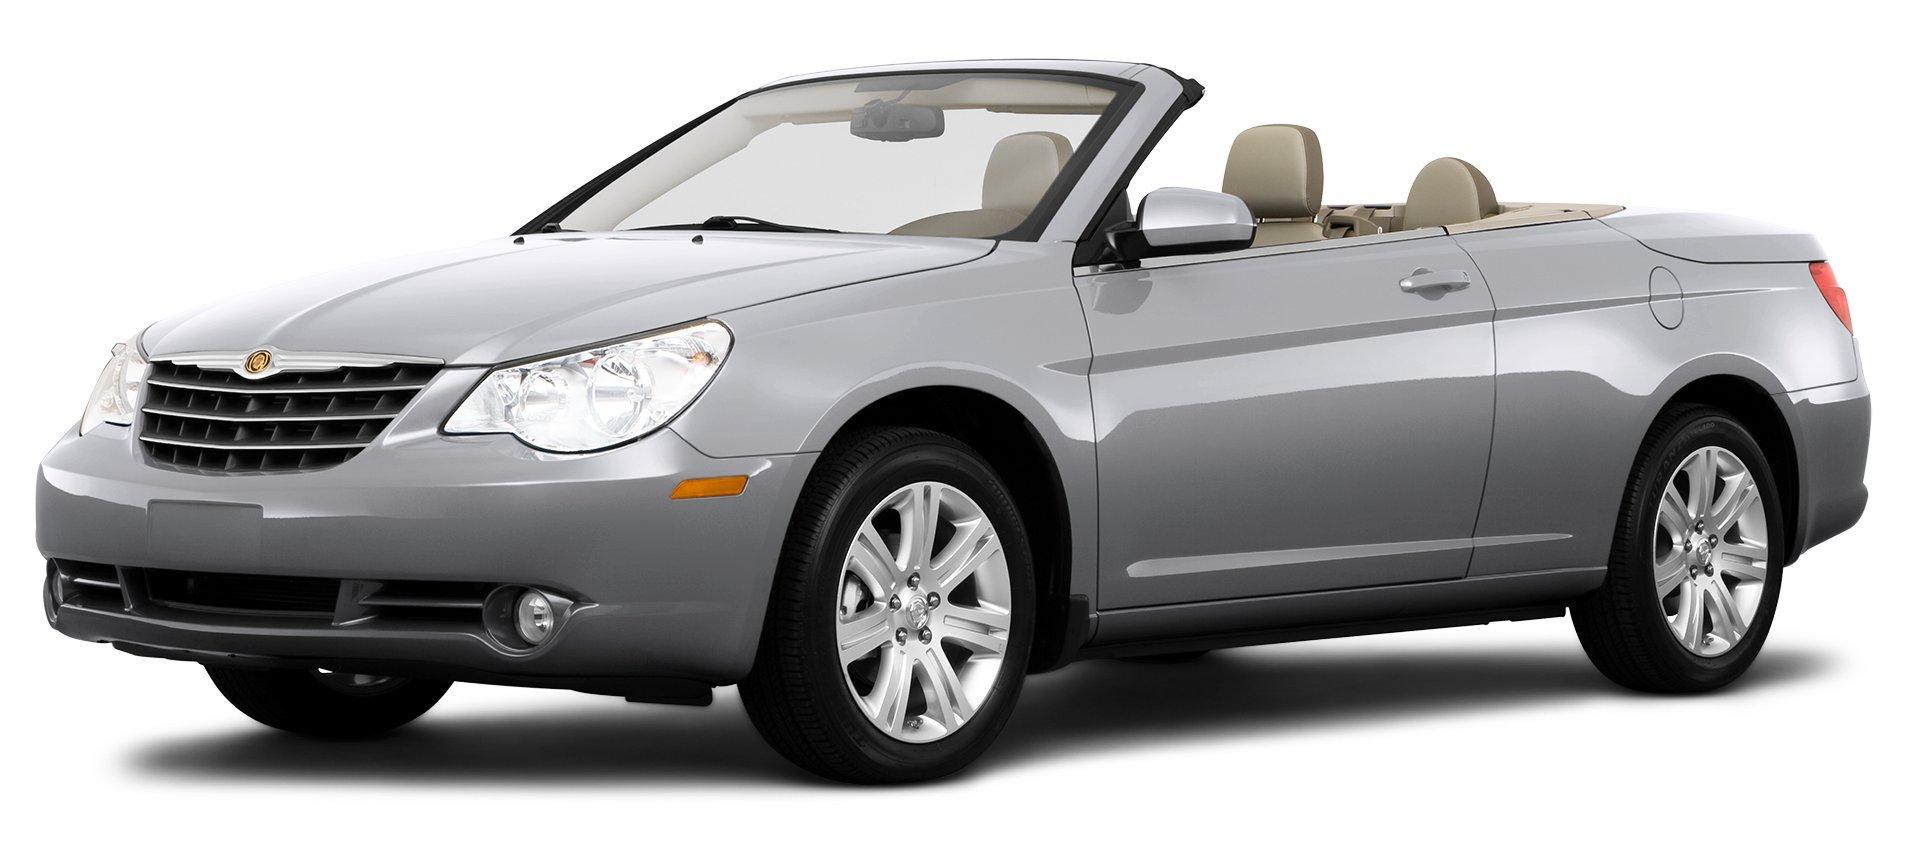 2010 Chrysler Sebring LX, 2-Door Convertible ...